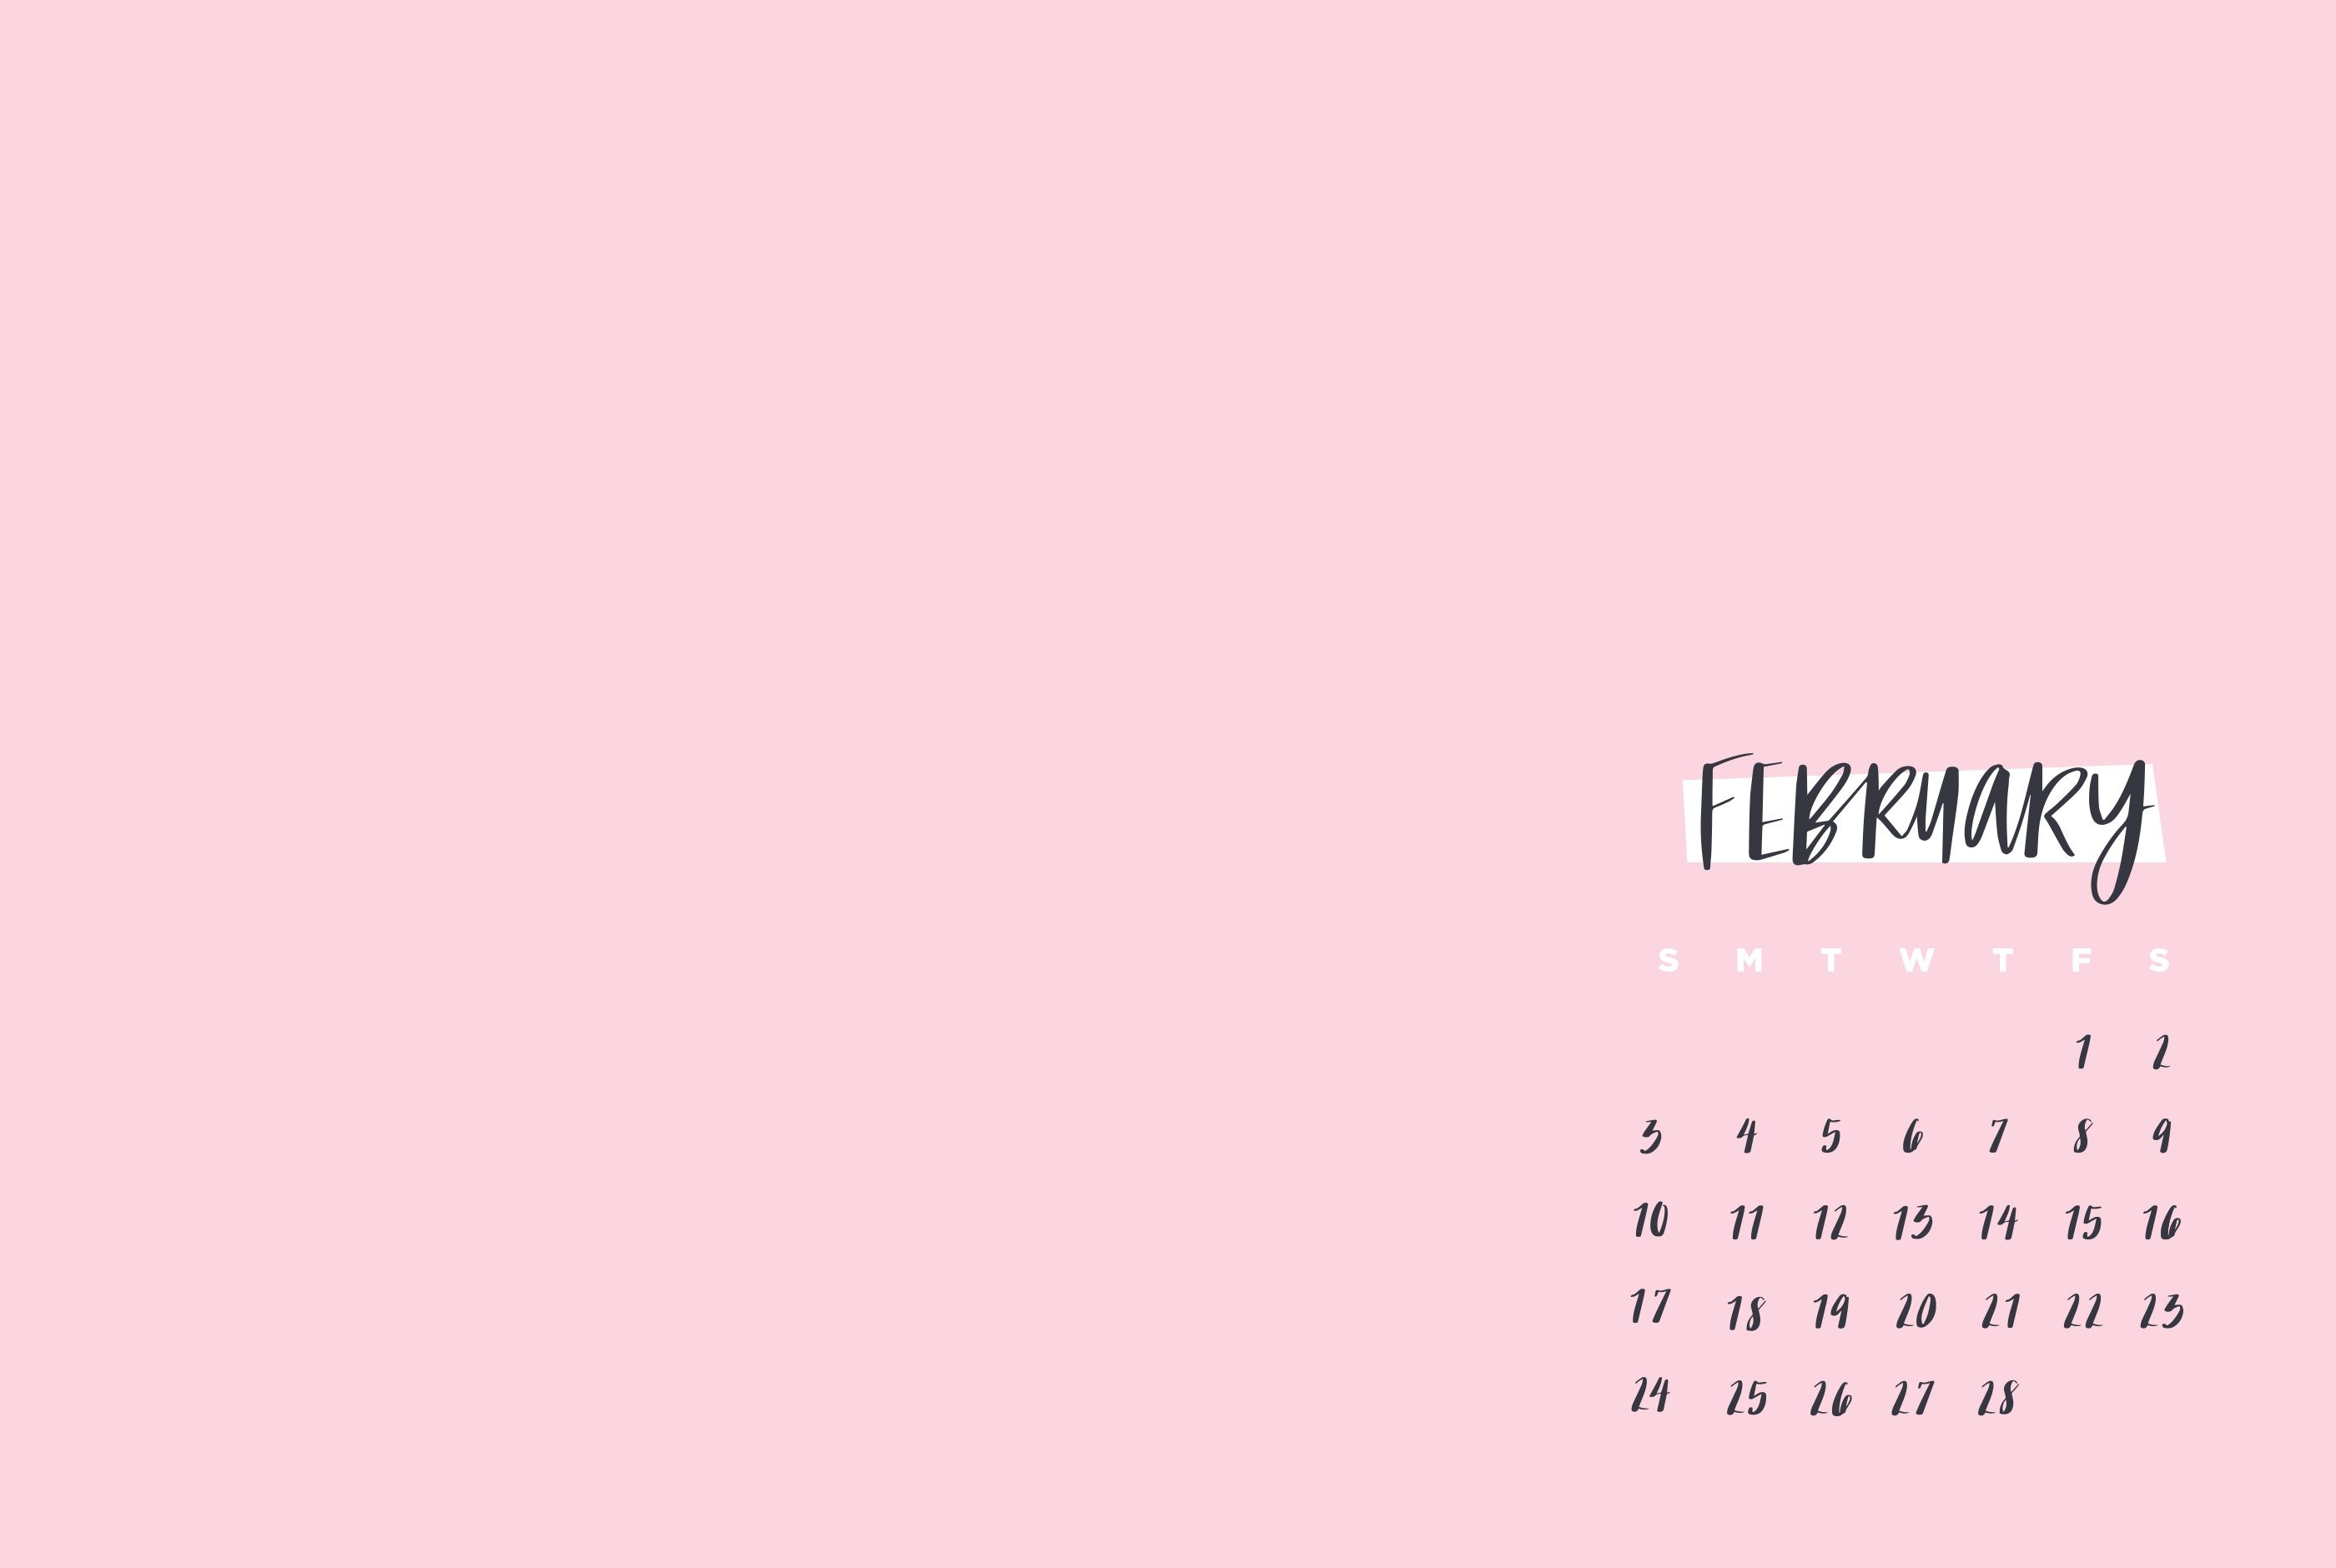 February 2019 Calendar Wallpaper Phone February 2019 Calendar Wallpaper | MaxCalendars in 2019 | Calendar